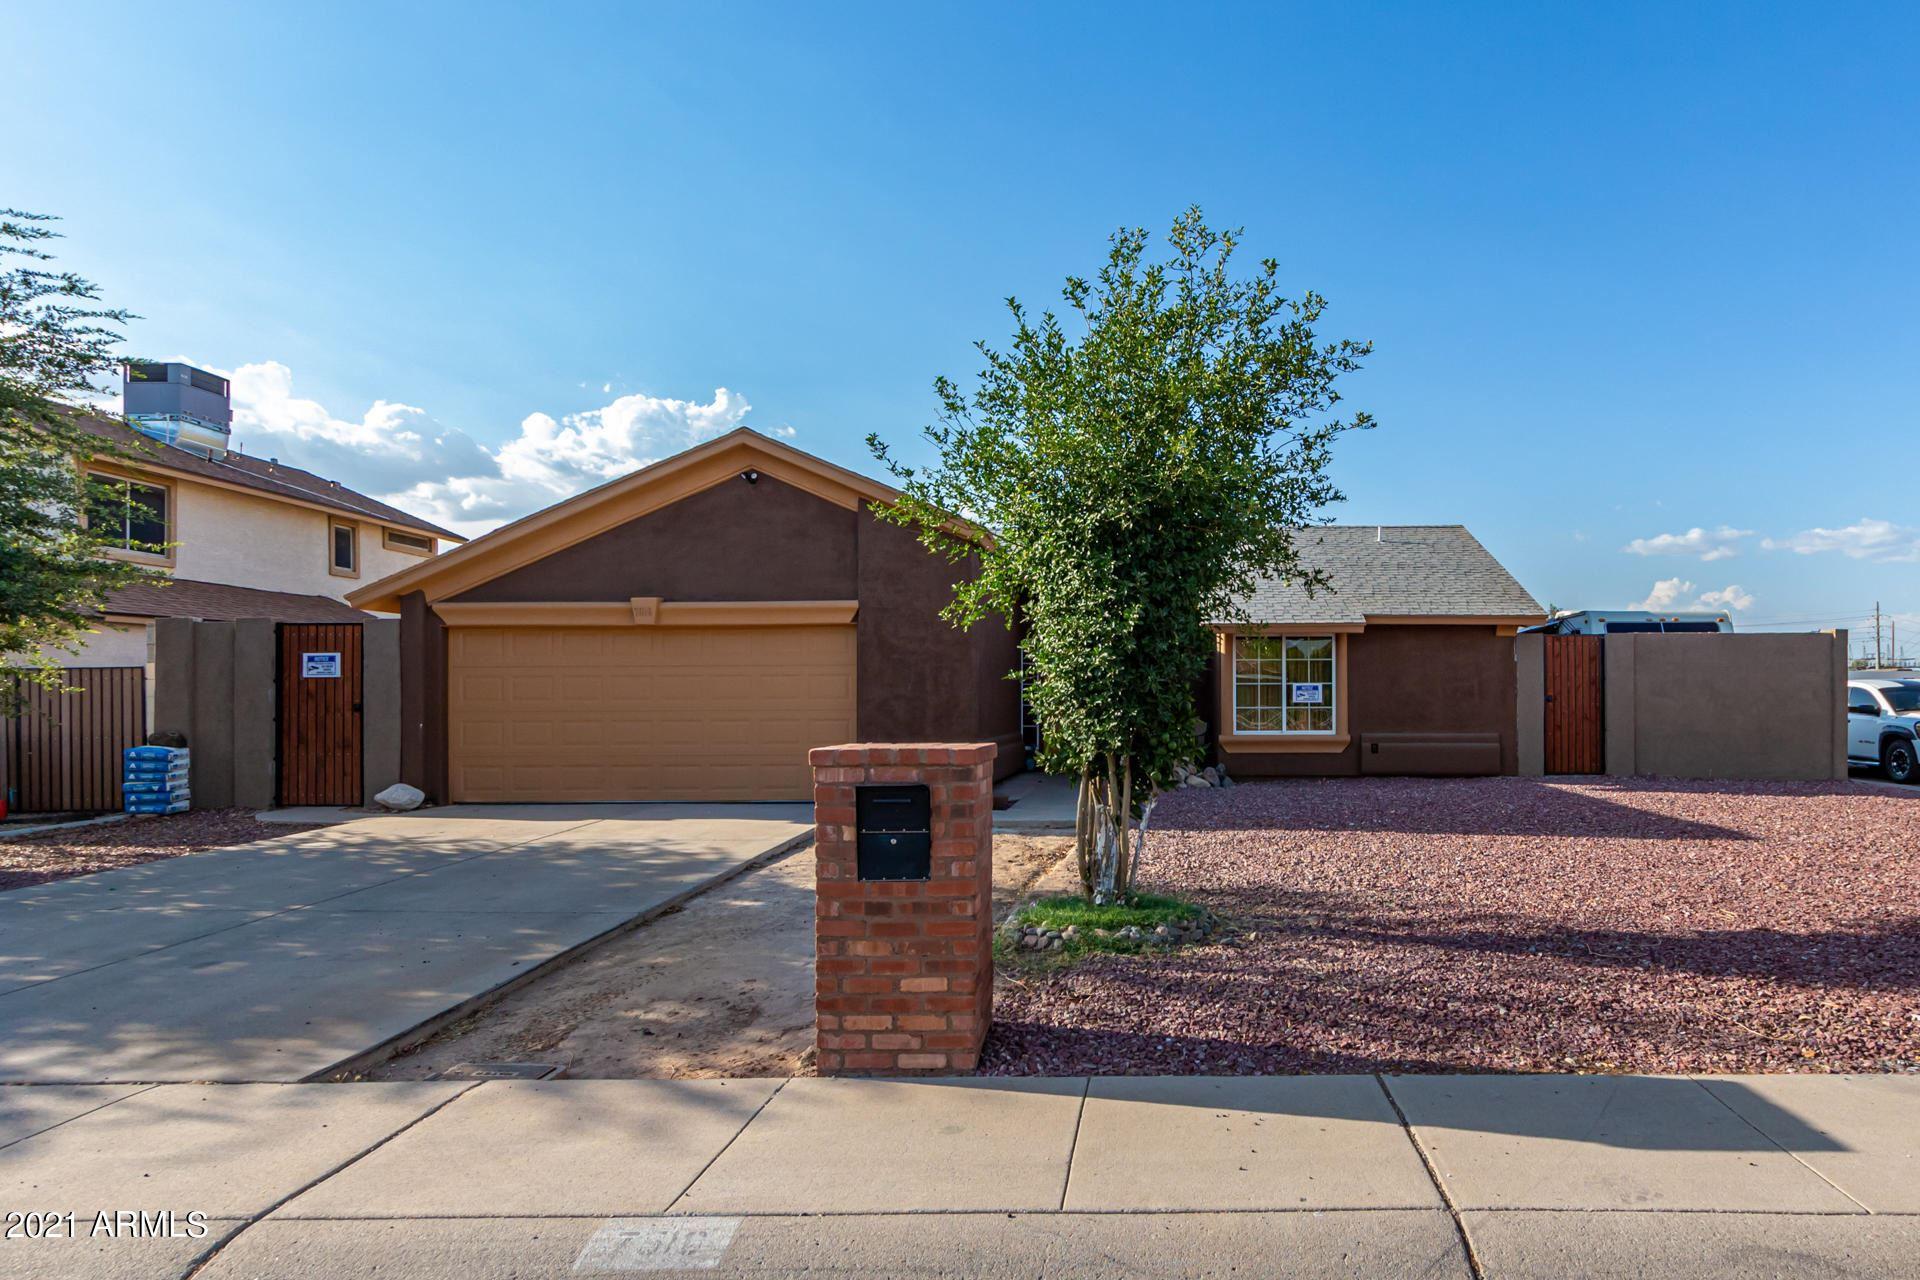 7516 W ELM Street, Phoenix, AZ 85033 - MLS#: 6259549